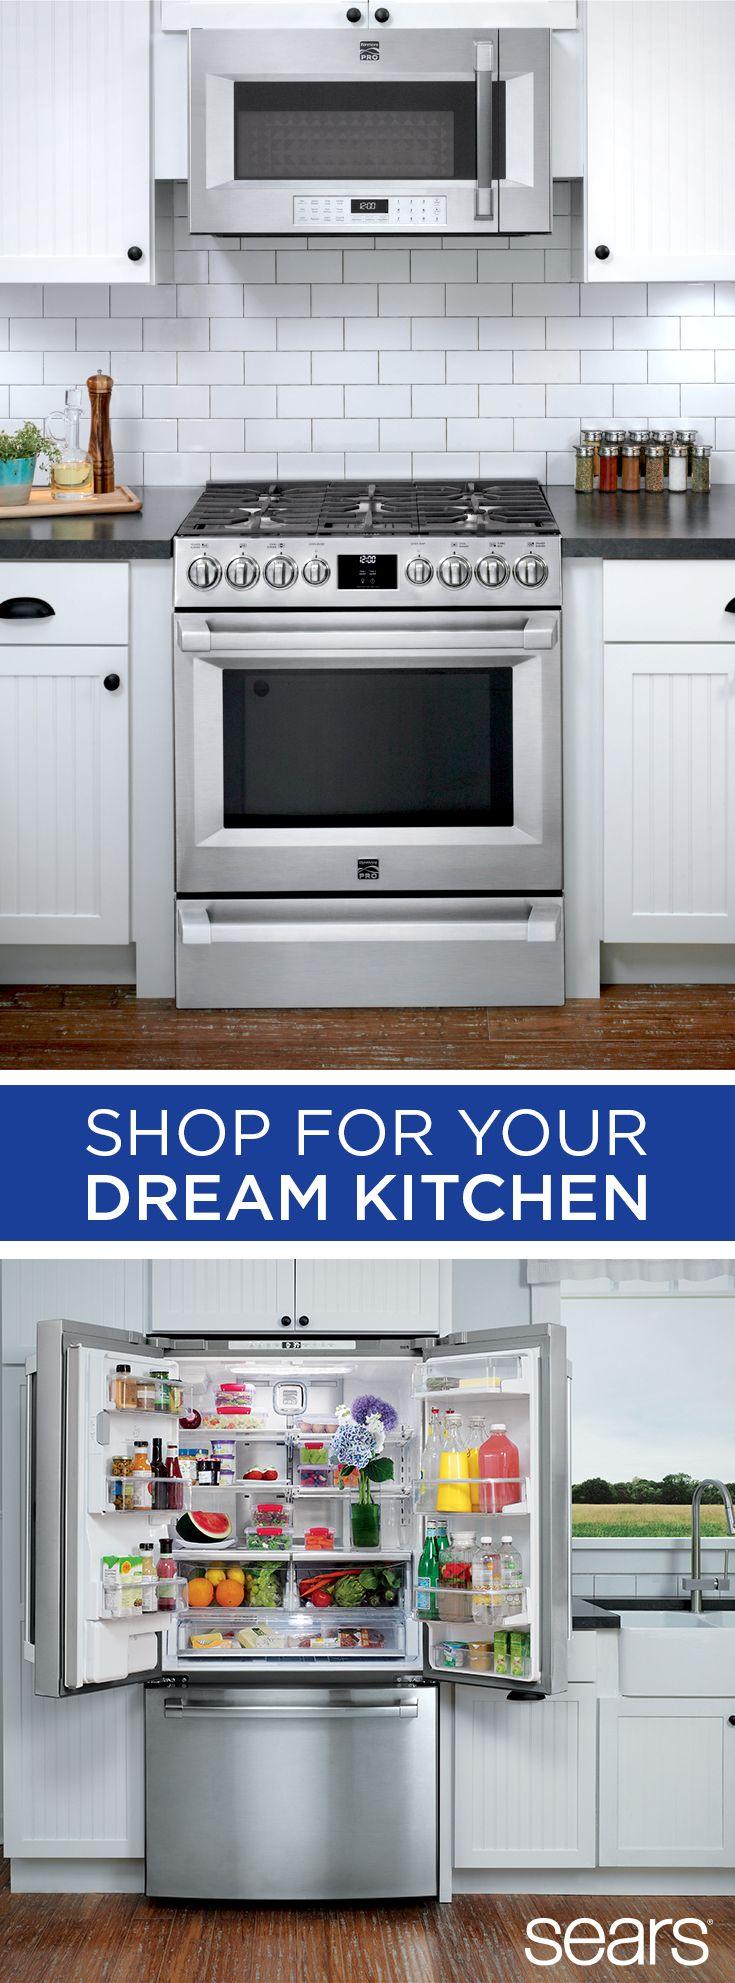 921 best images about kitchen ideas on pinterest kitchen for Dream kitchen appliances